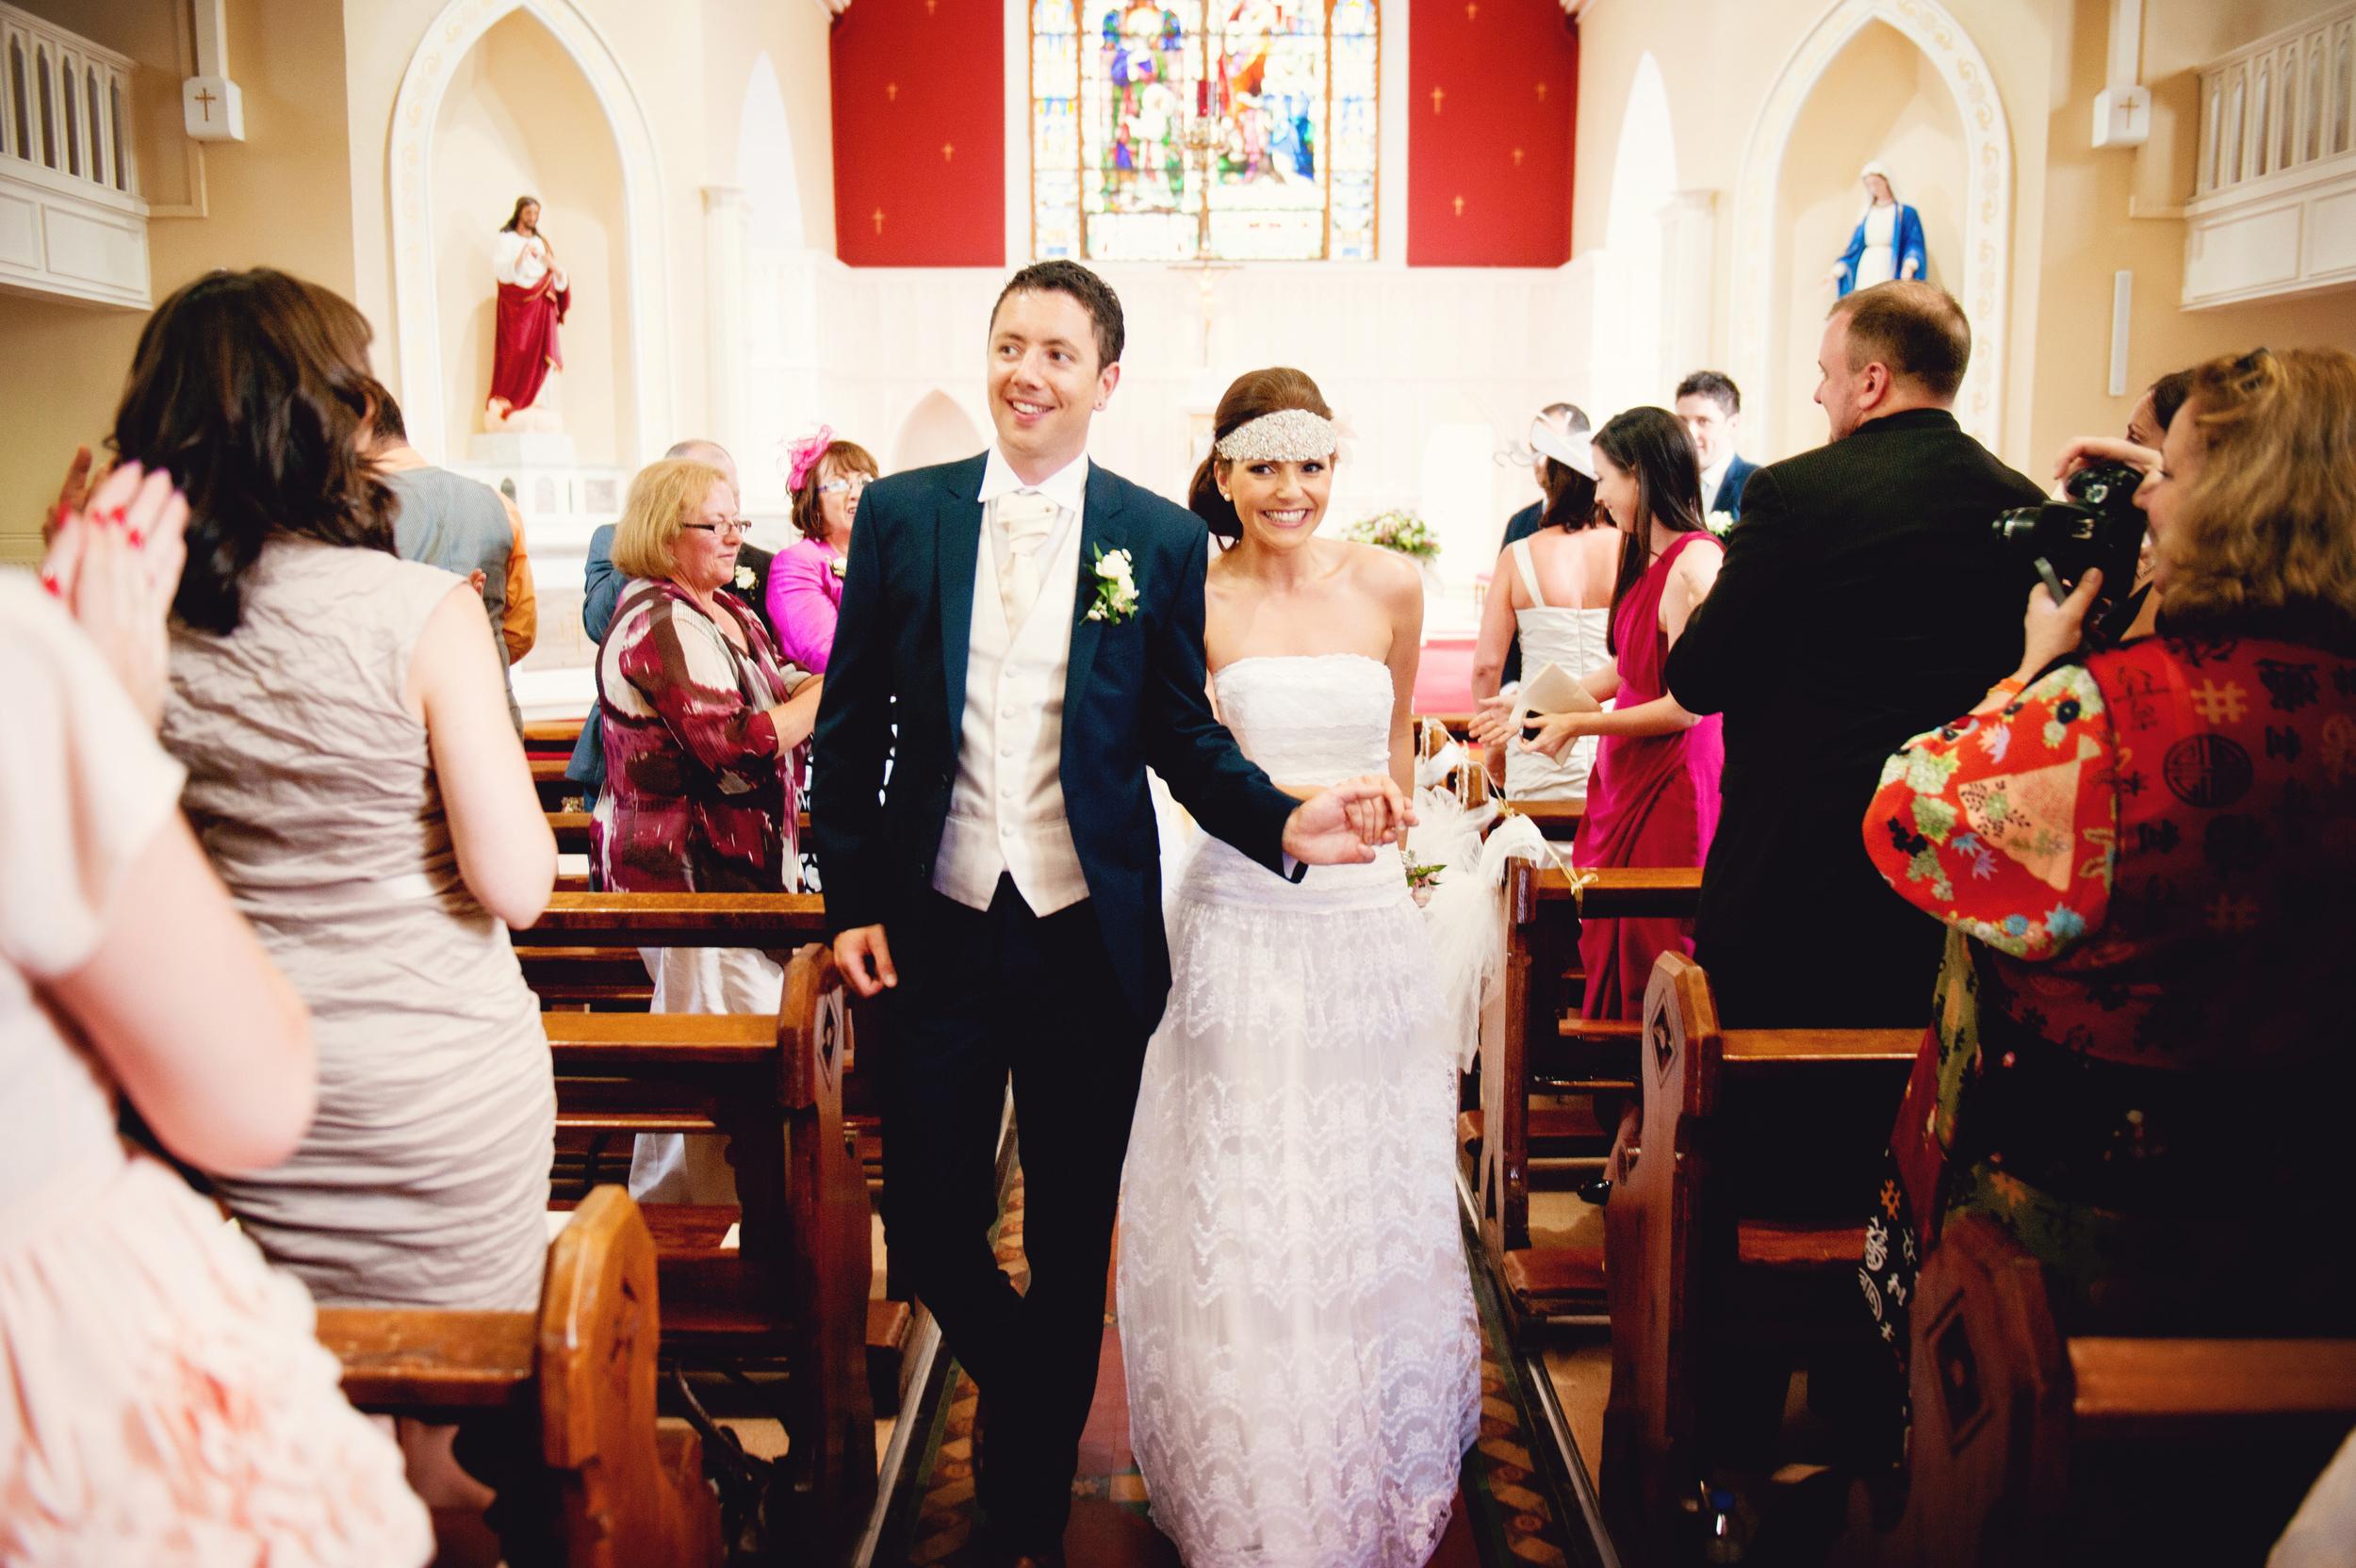 Just Married! Photography:  Weddings by KARA  © - Wedding Location: Kilshane House, Tipperary, Ireland